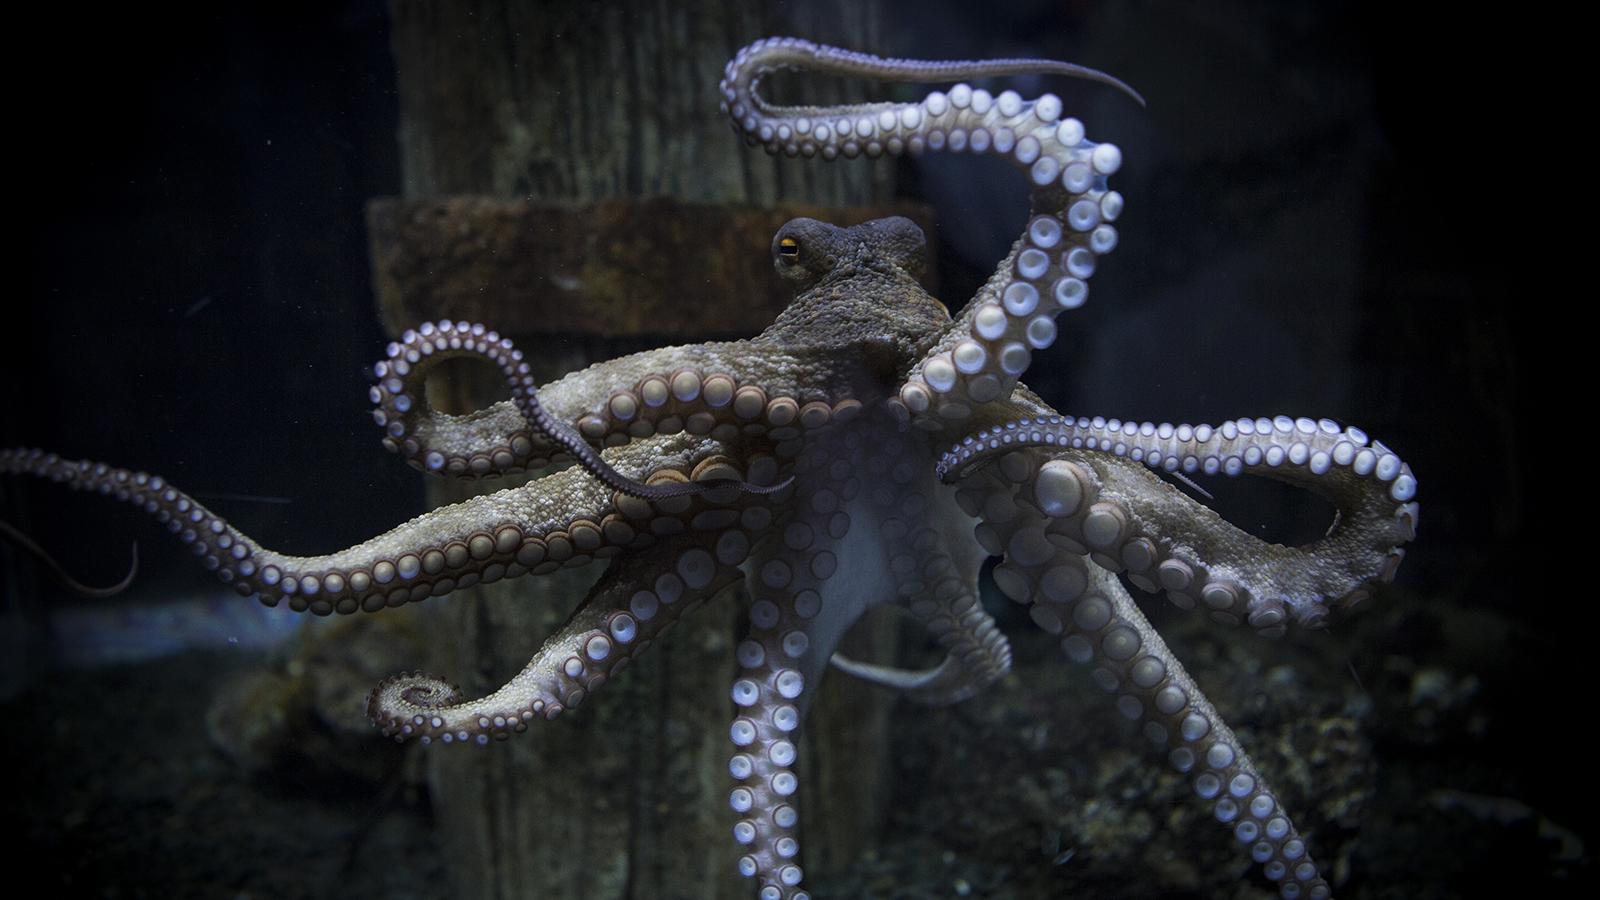 octopus-photos-rambo